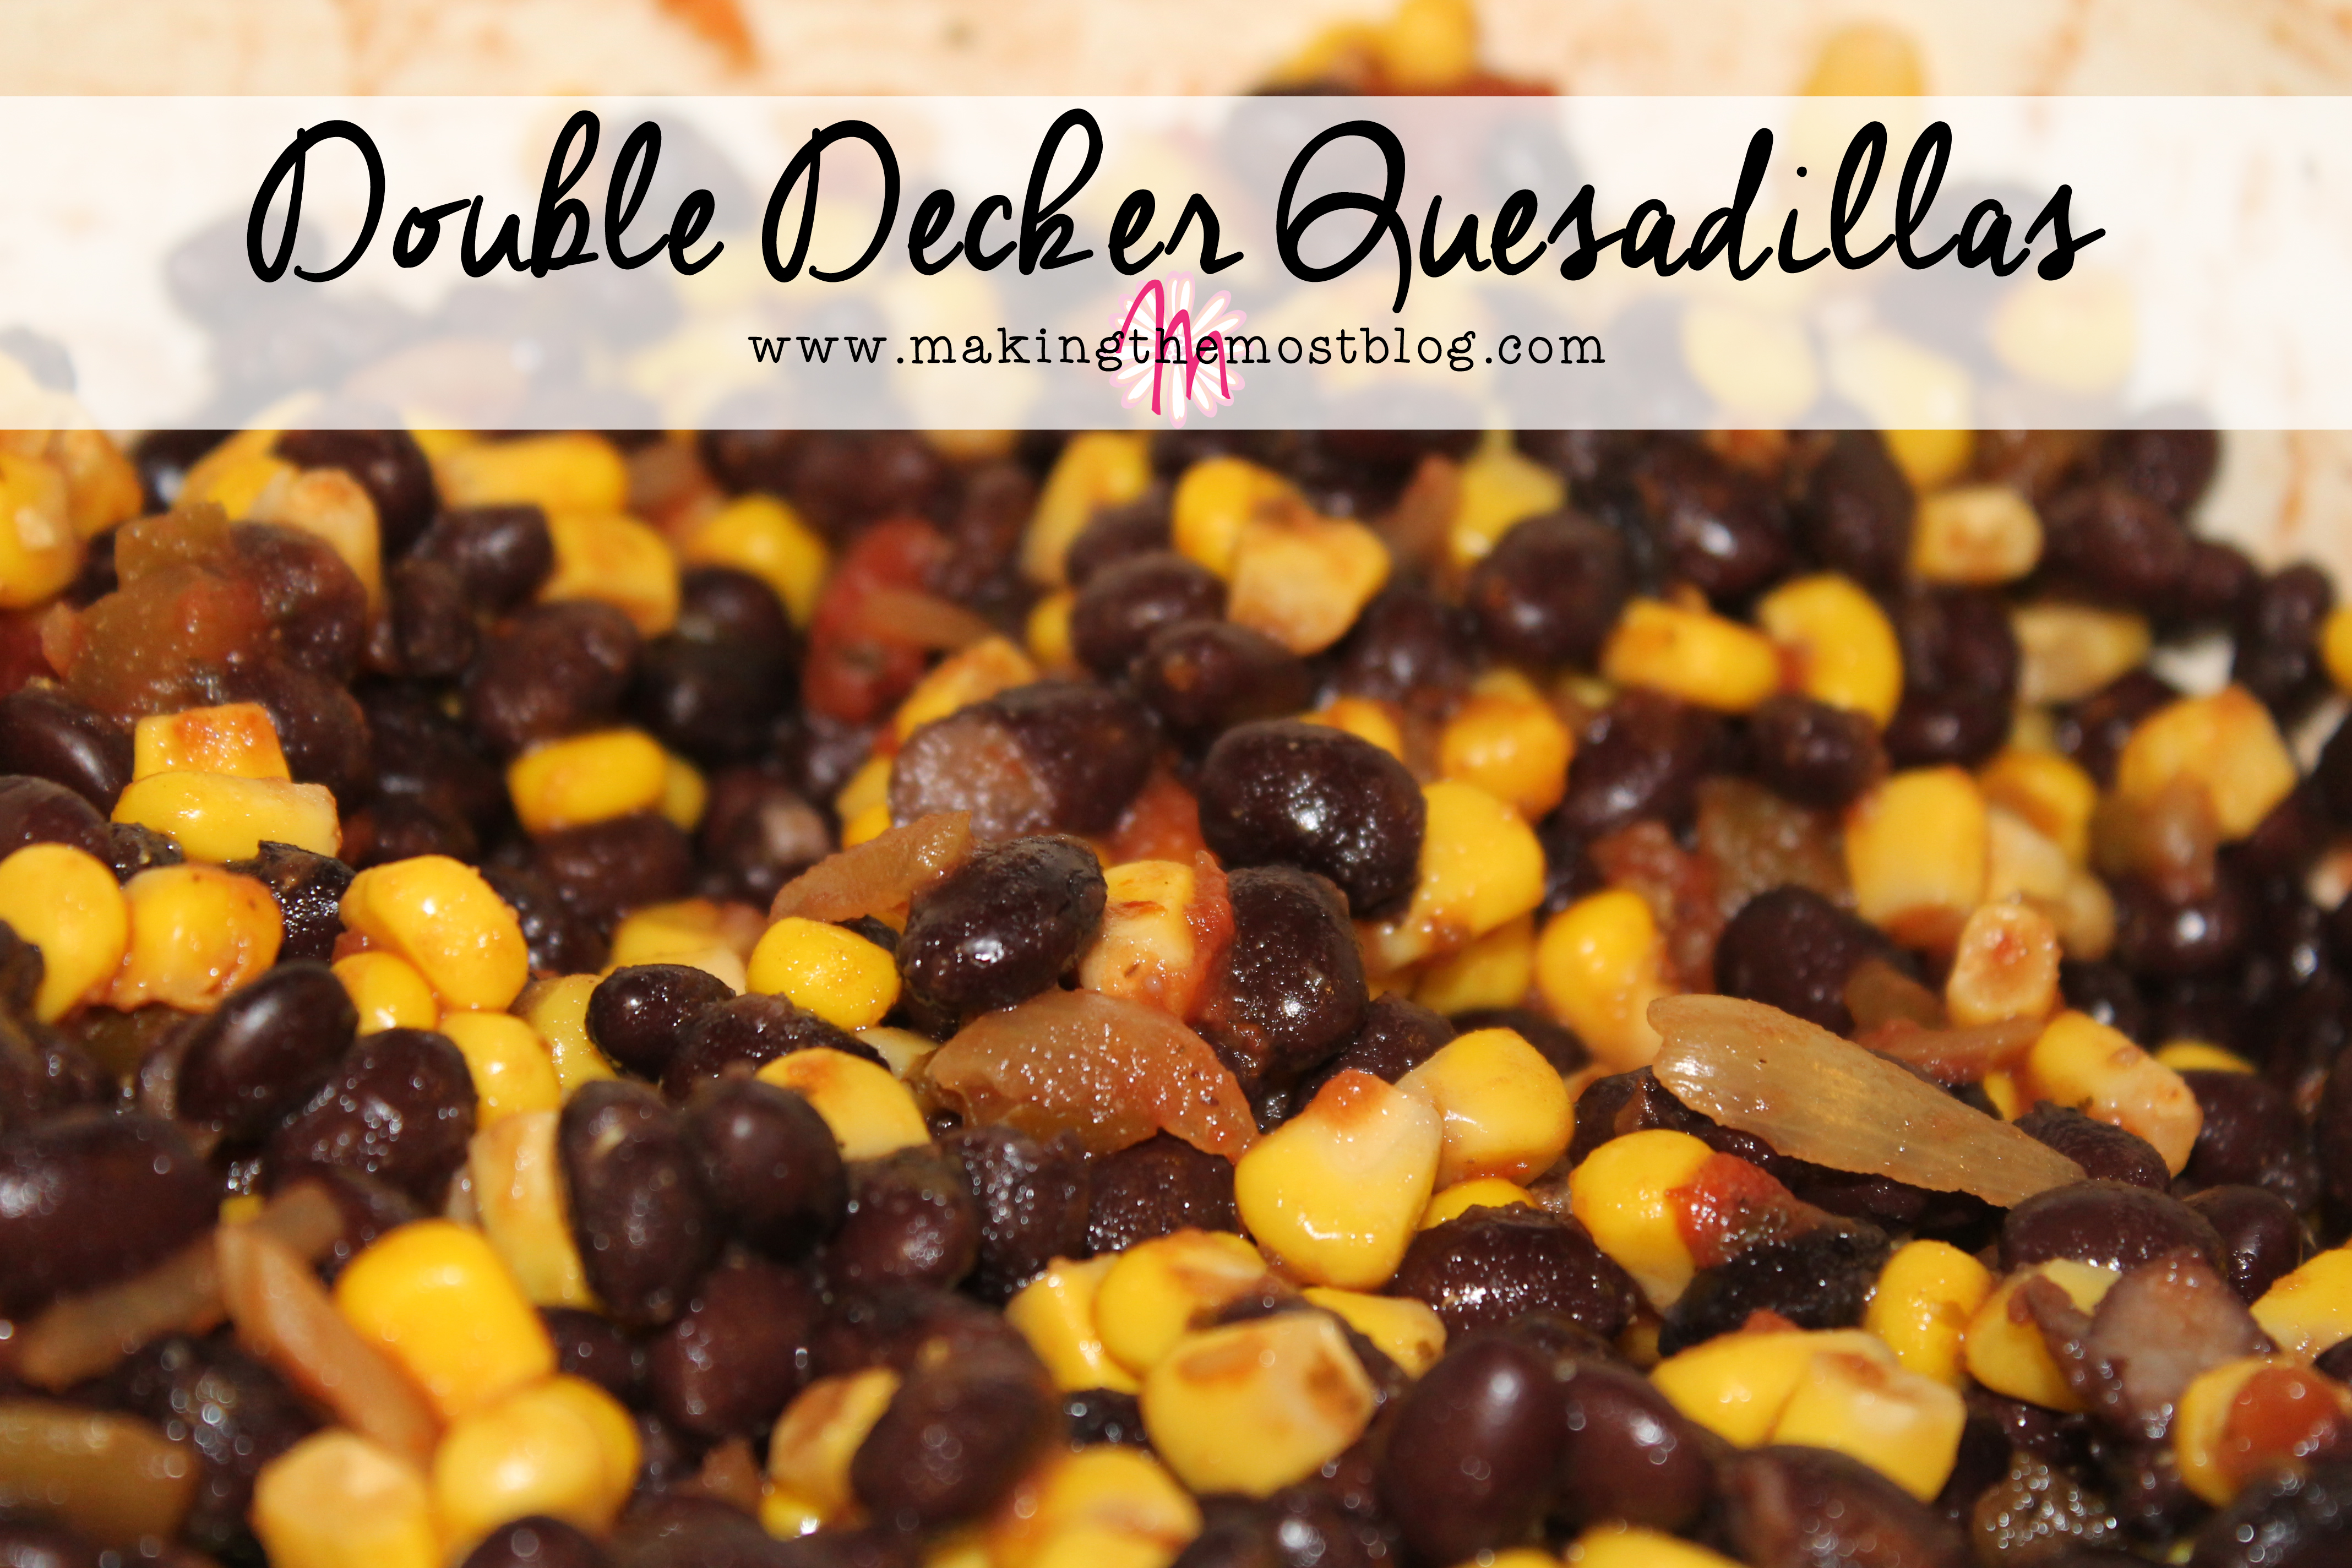 Double Decker Quesadilla Recipe   Making the Most Blog